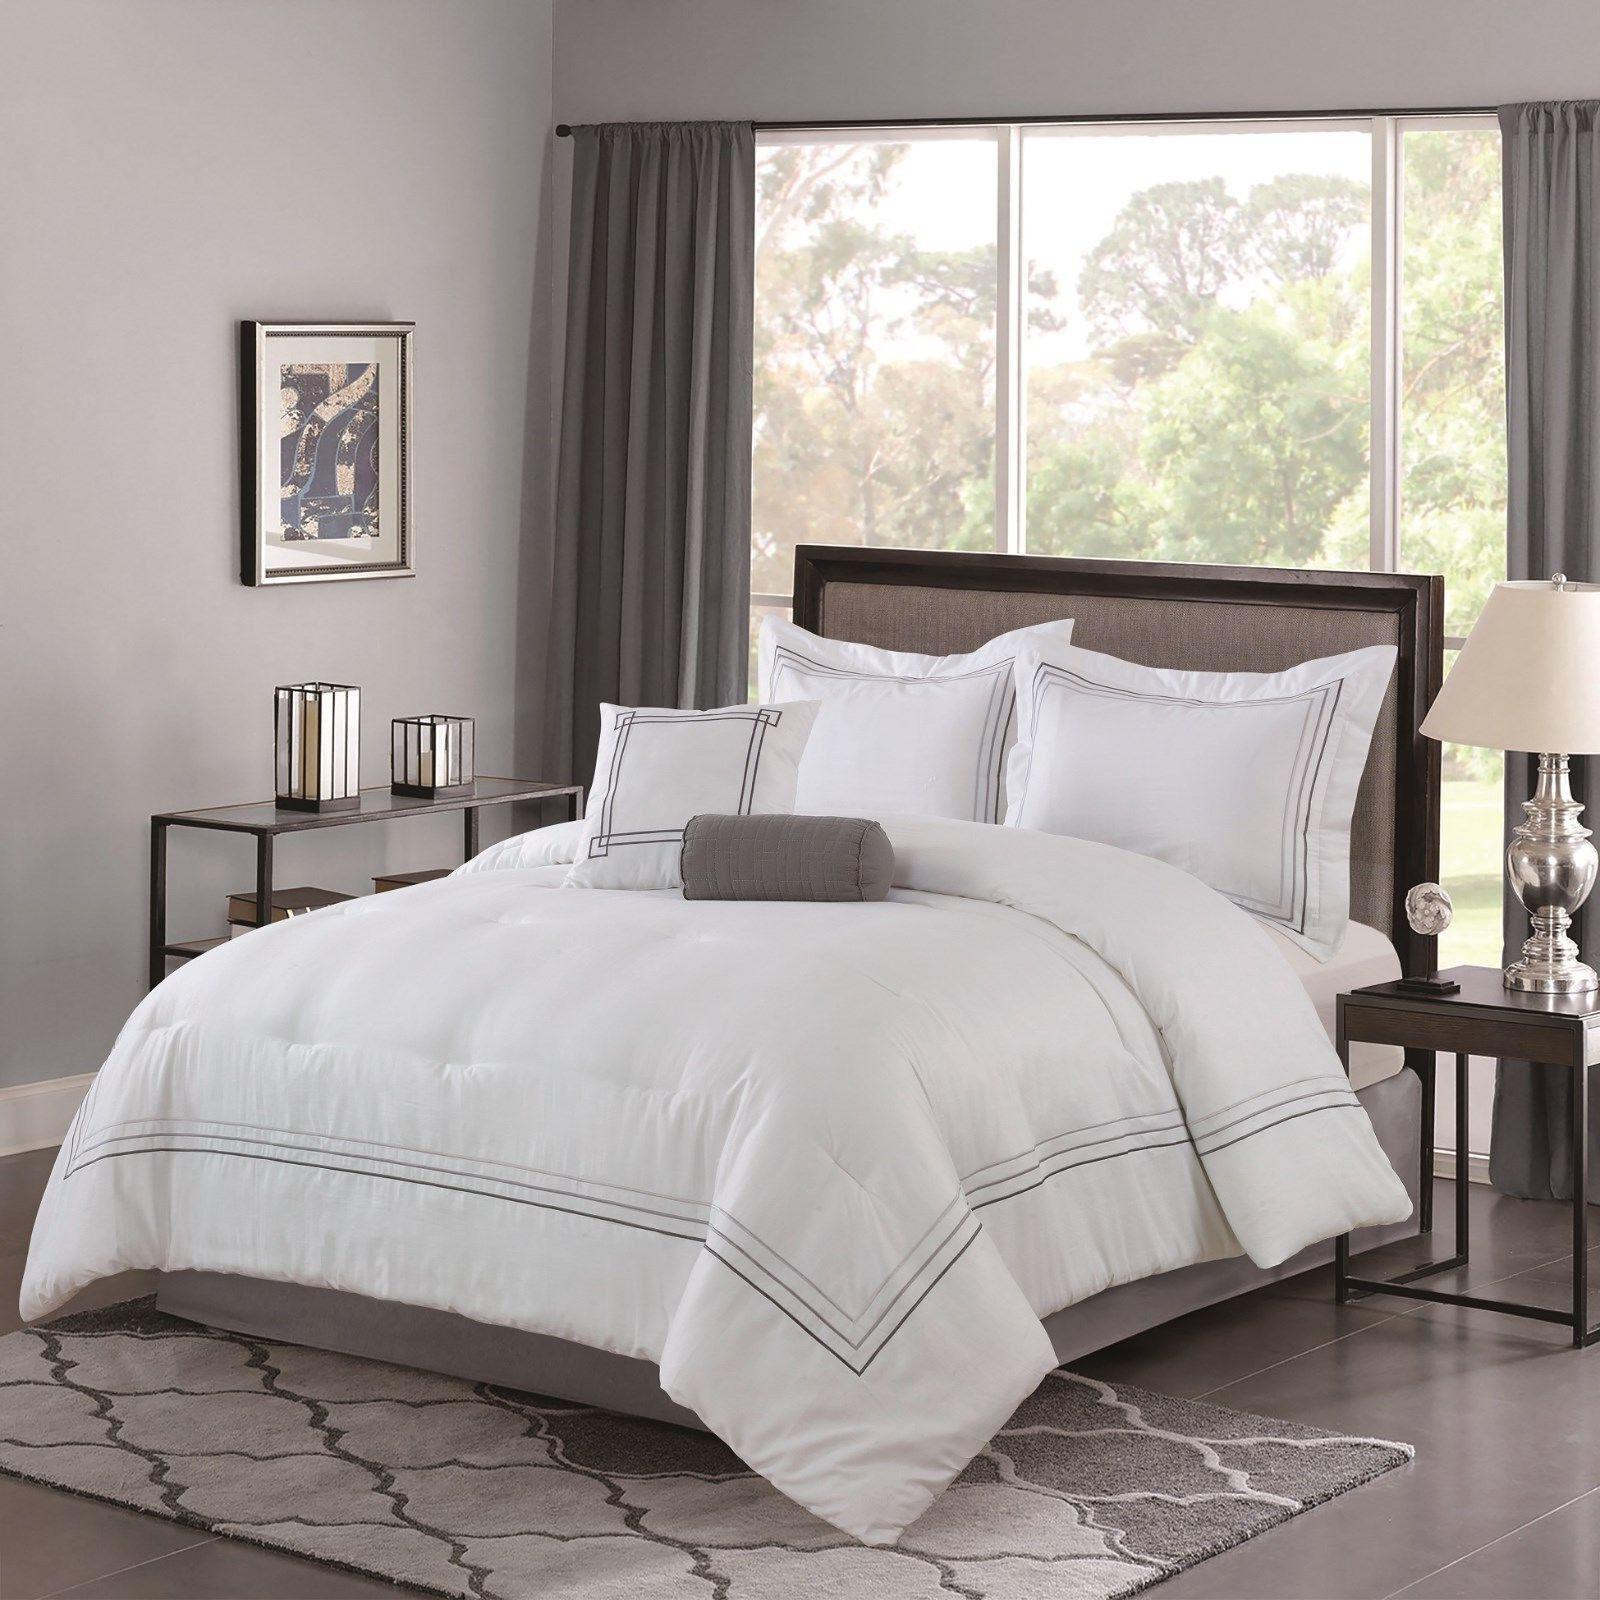 100% Cotton Weiß grau Hotel Design 5 pcs King Queen Comforter Set